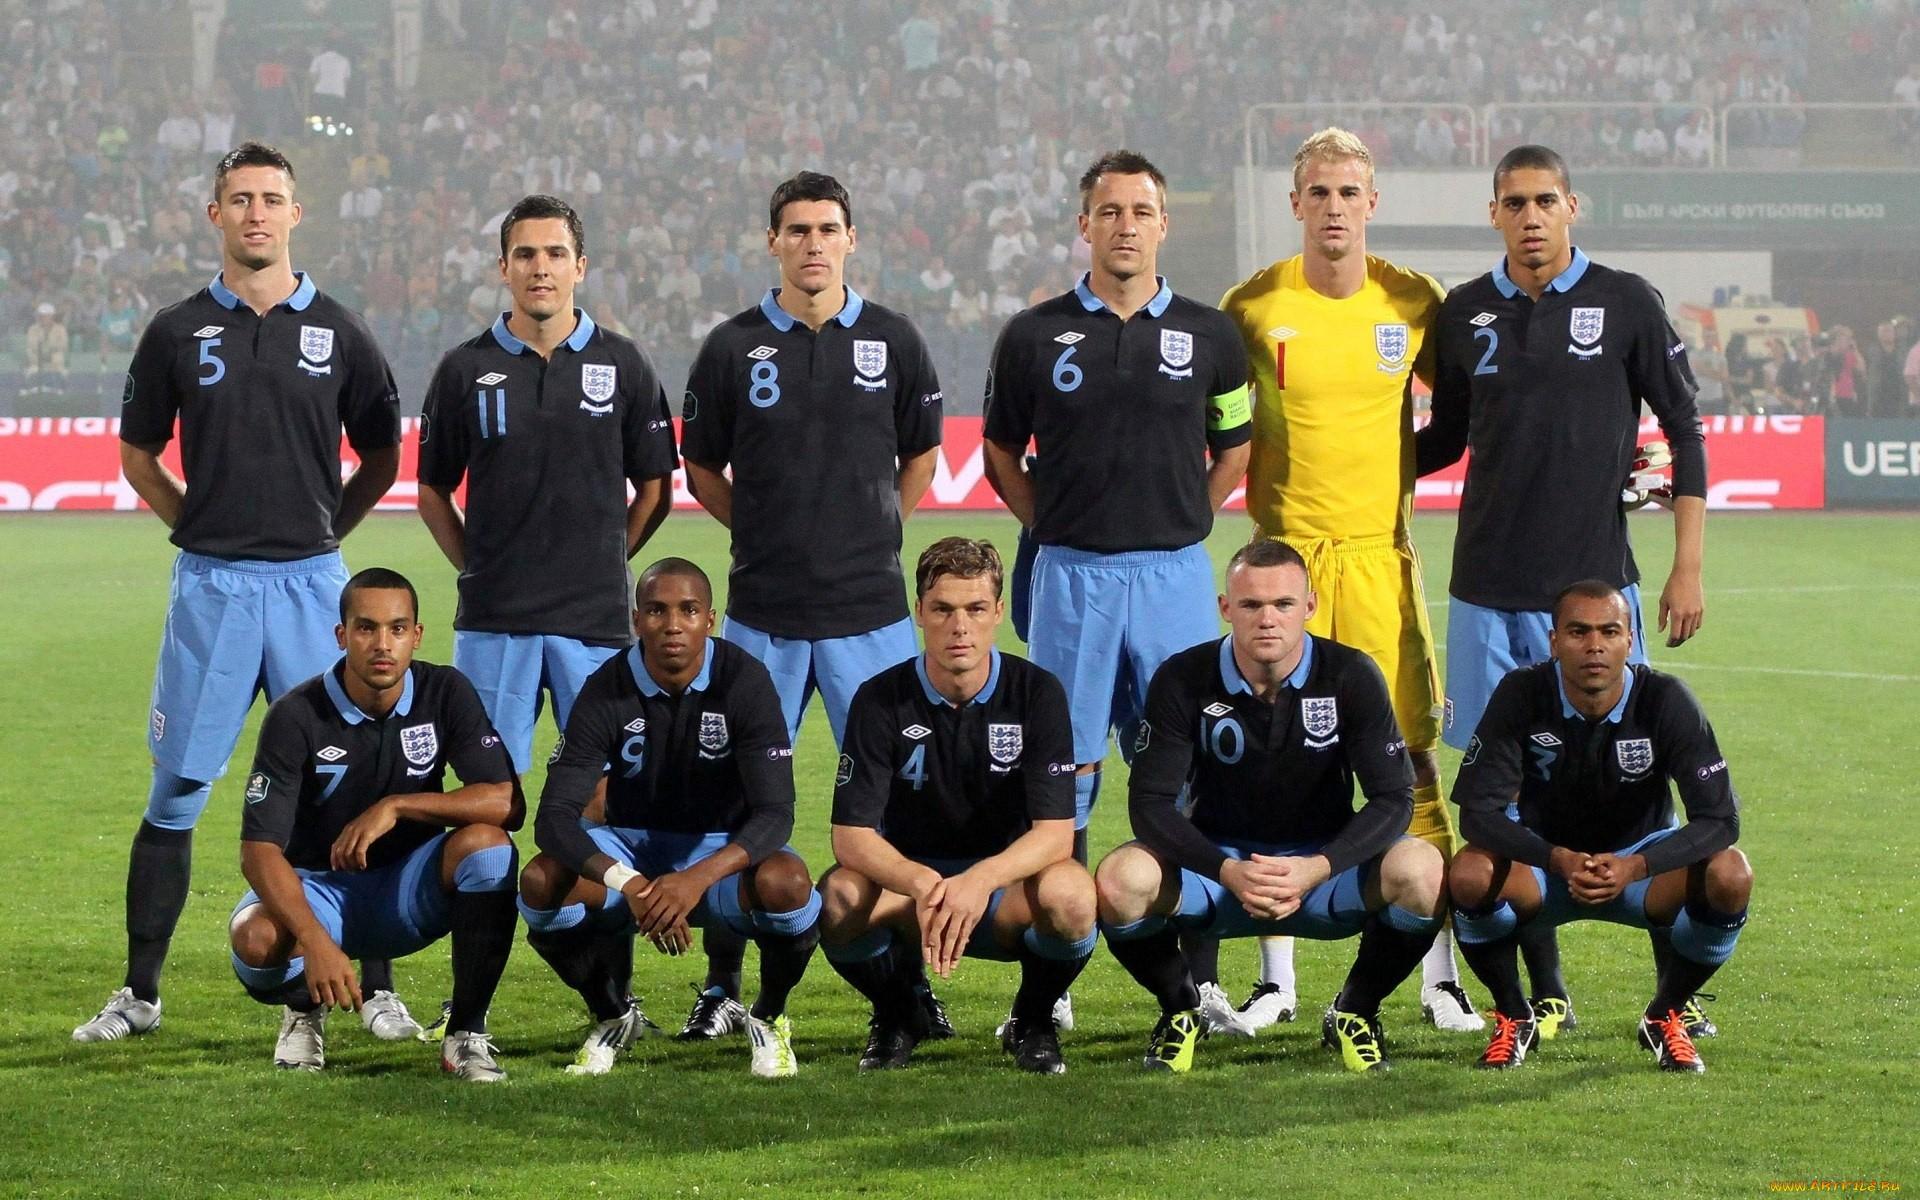 2 England National Football Team Hd Wallpapers